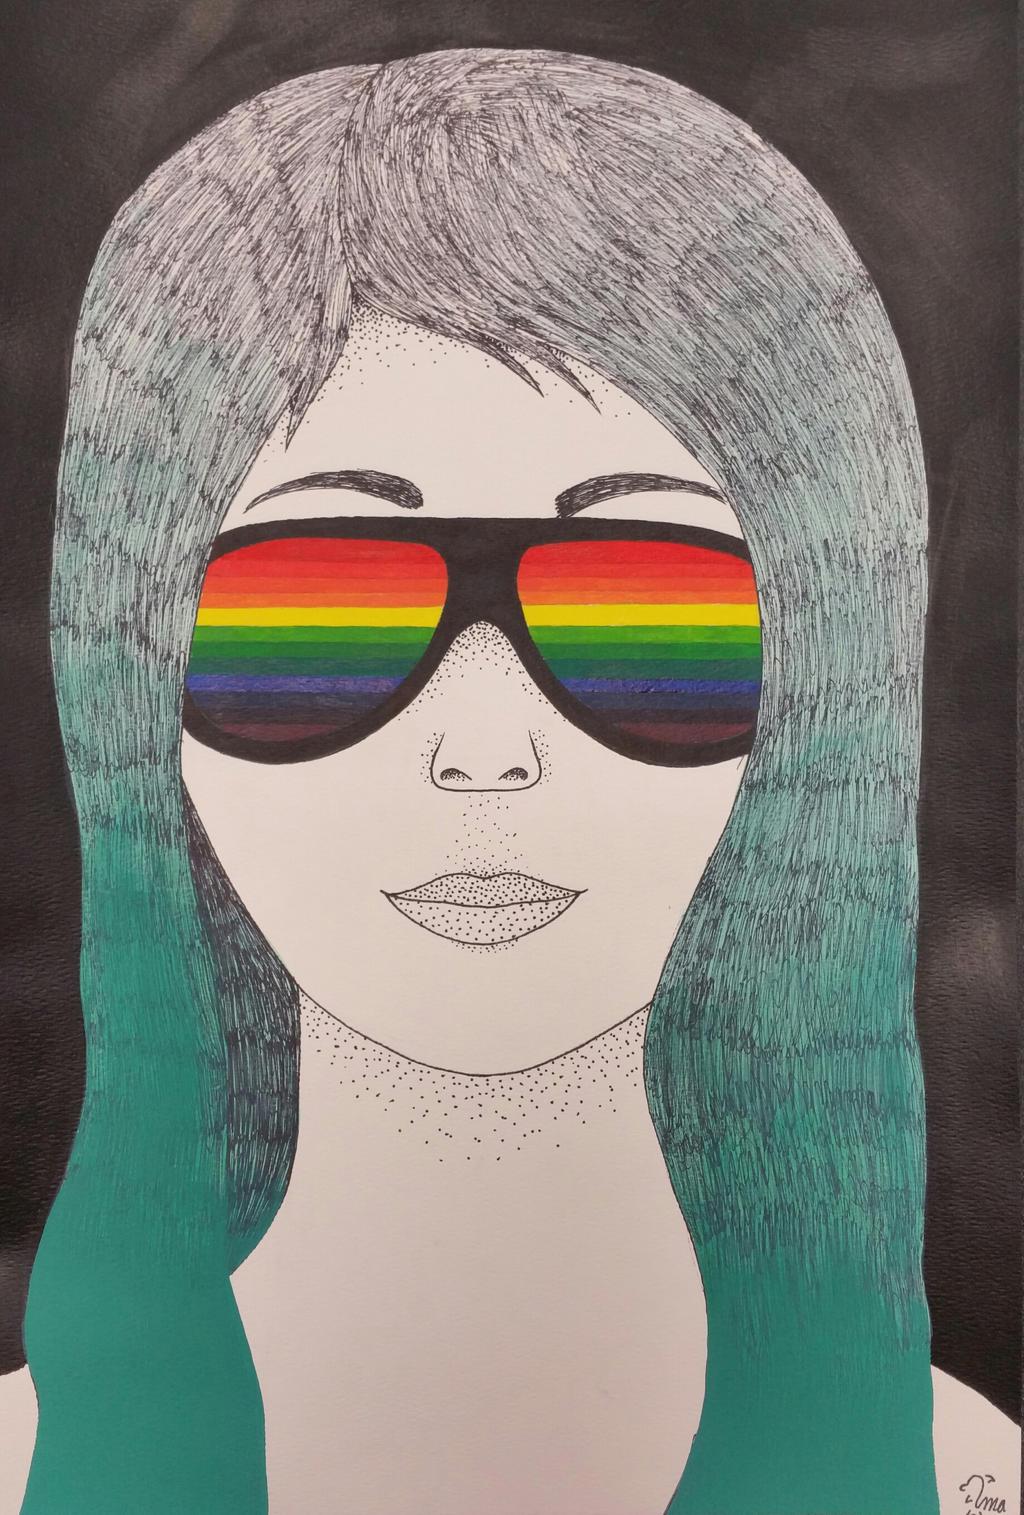 Oceanblue-Art's Profile Picture